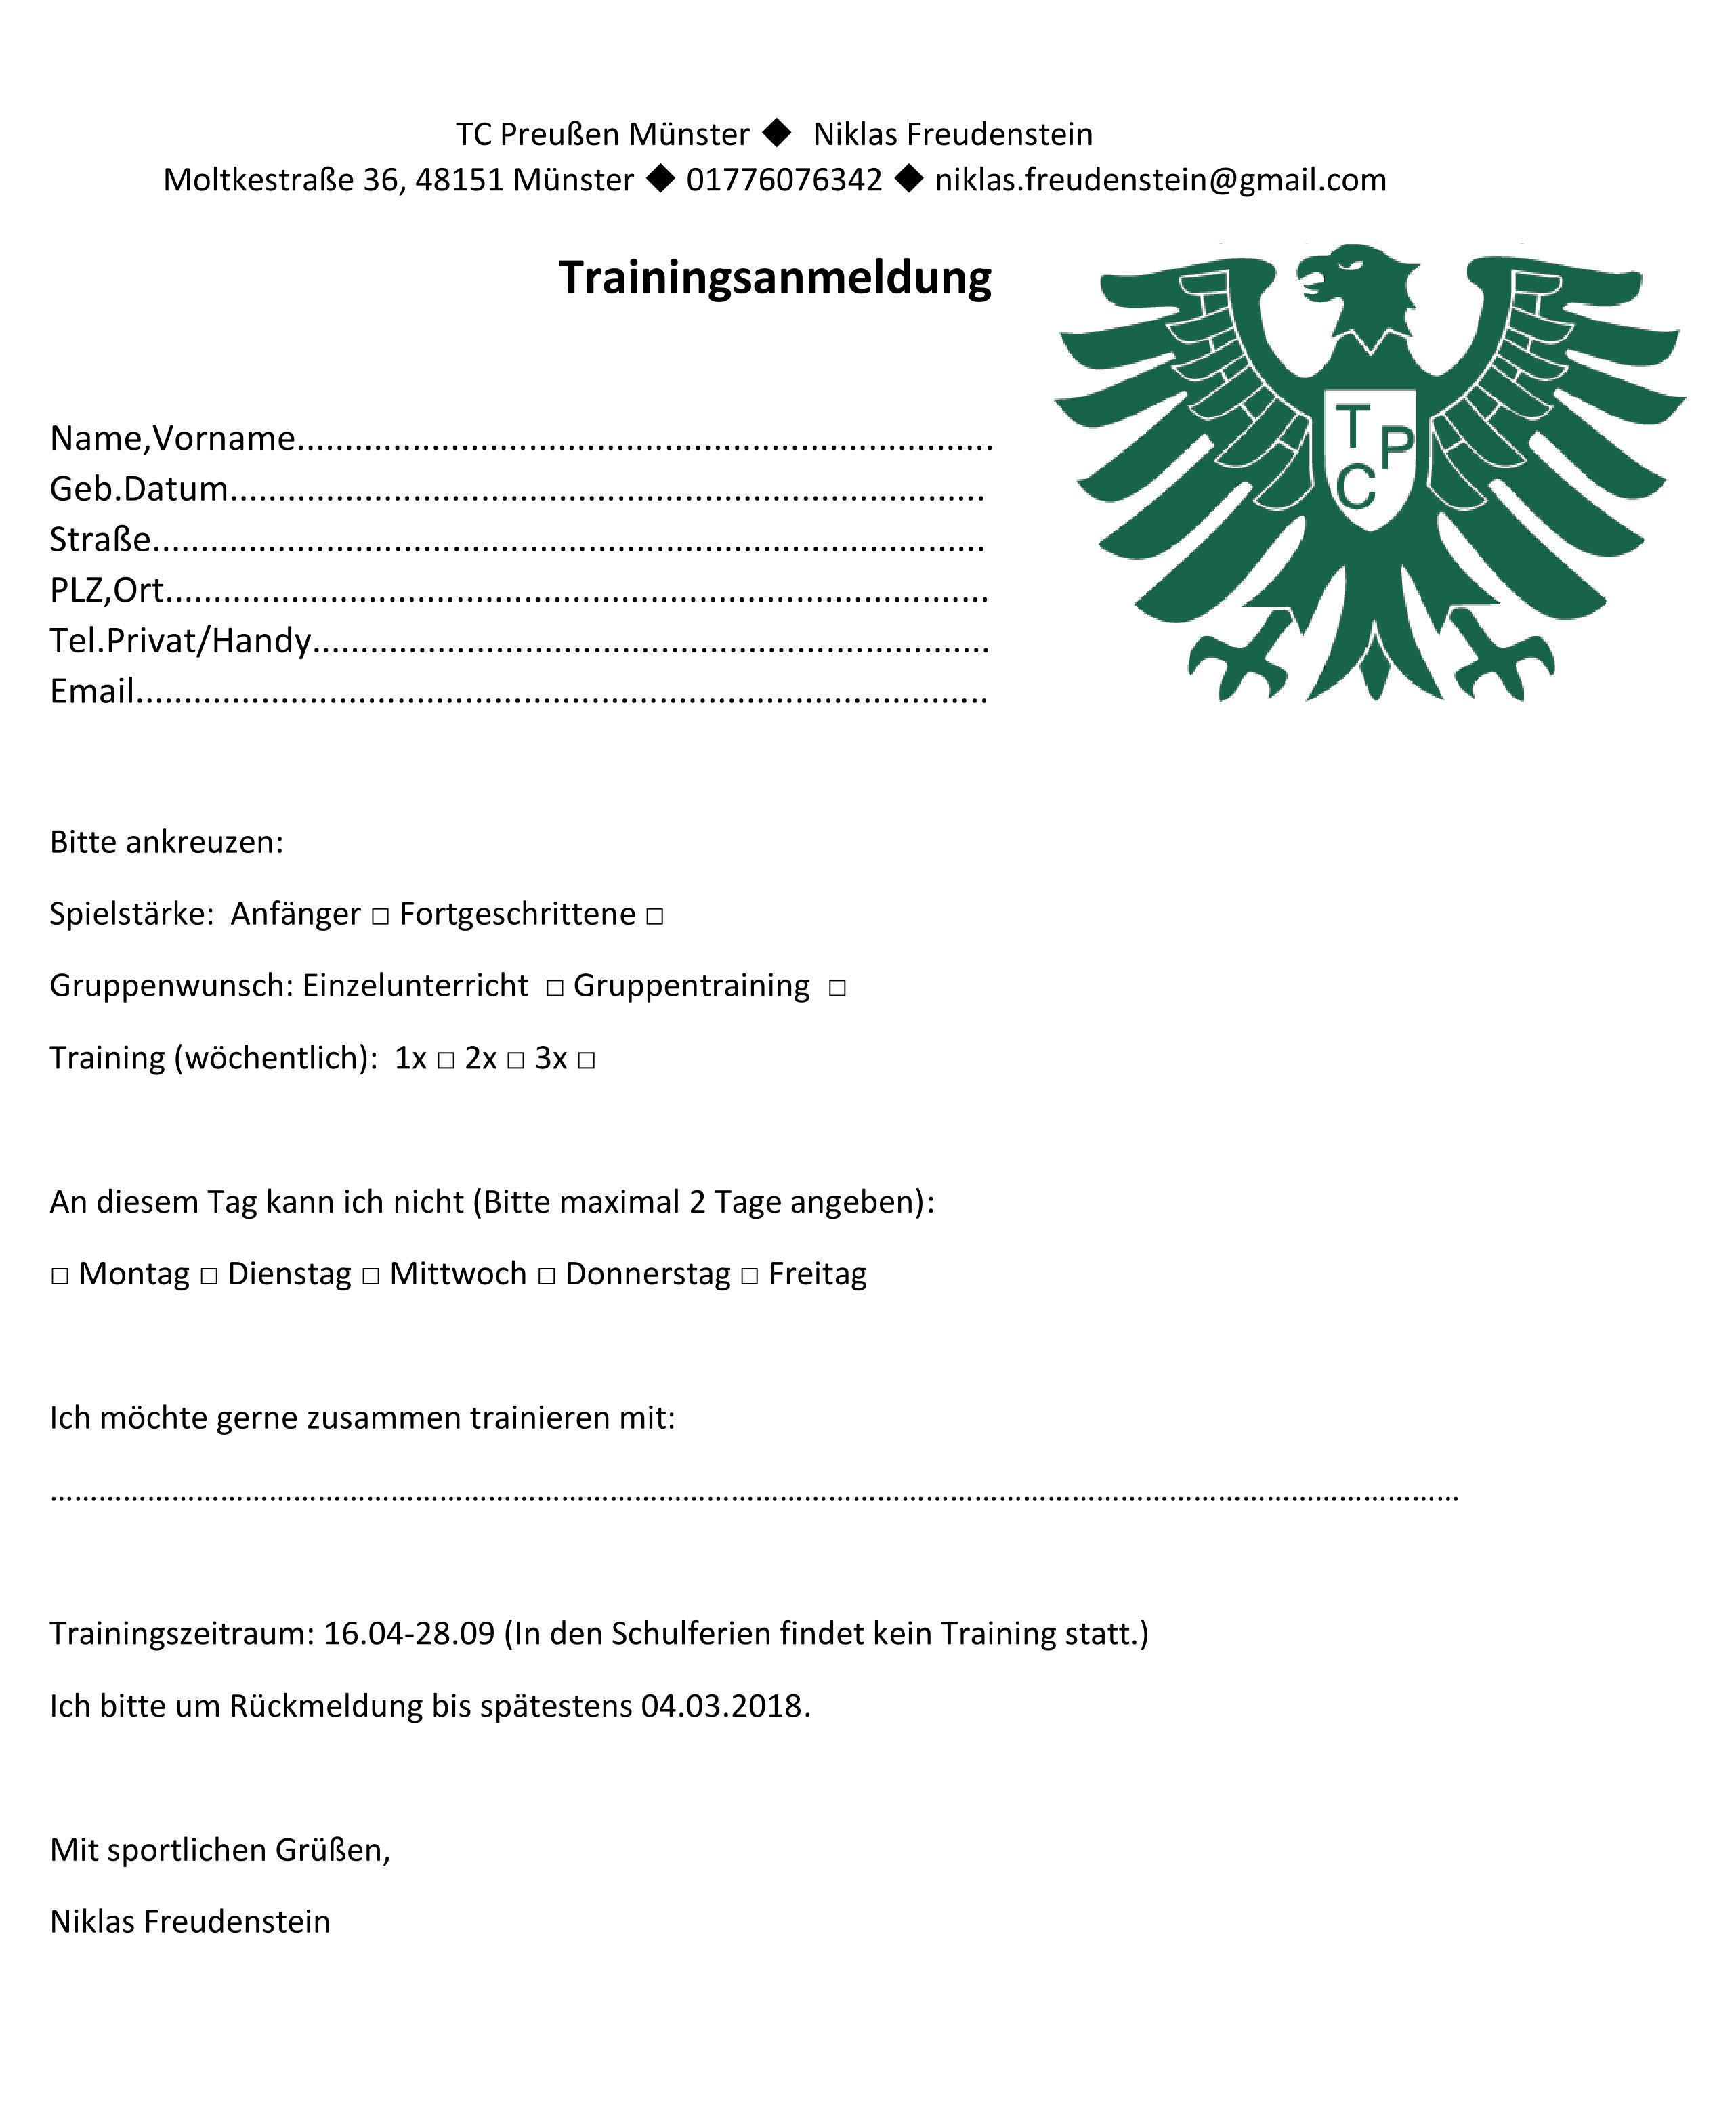 Trainingsanmeldung TC Preußen Münster